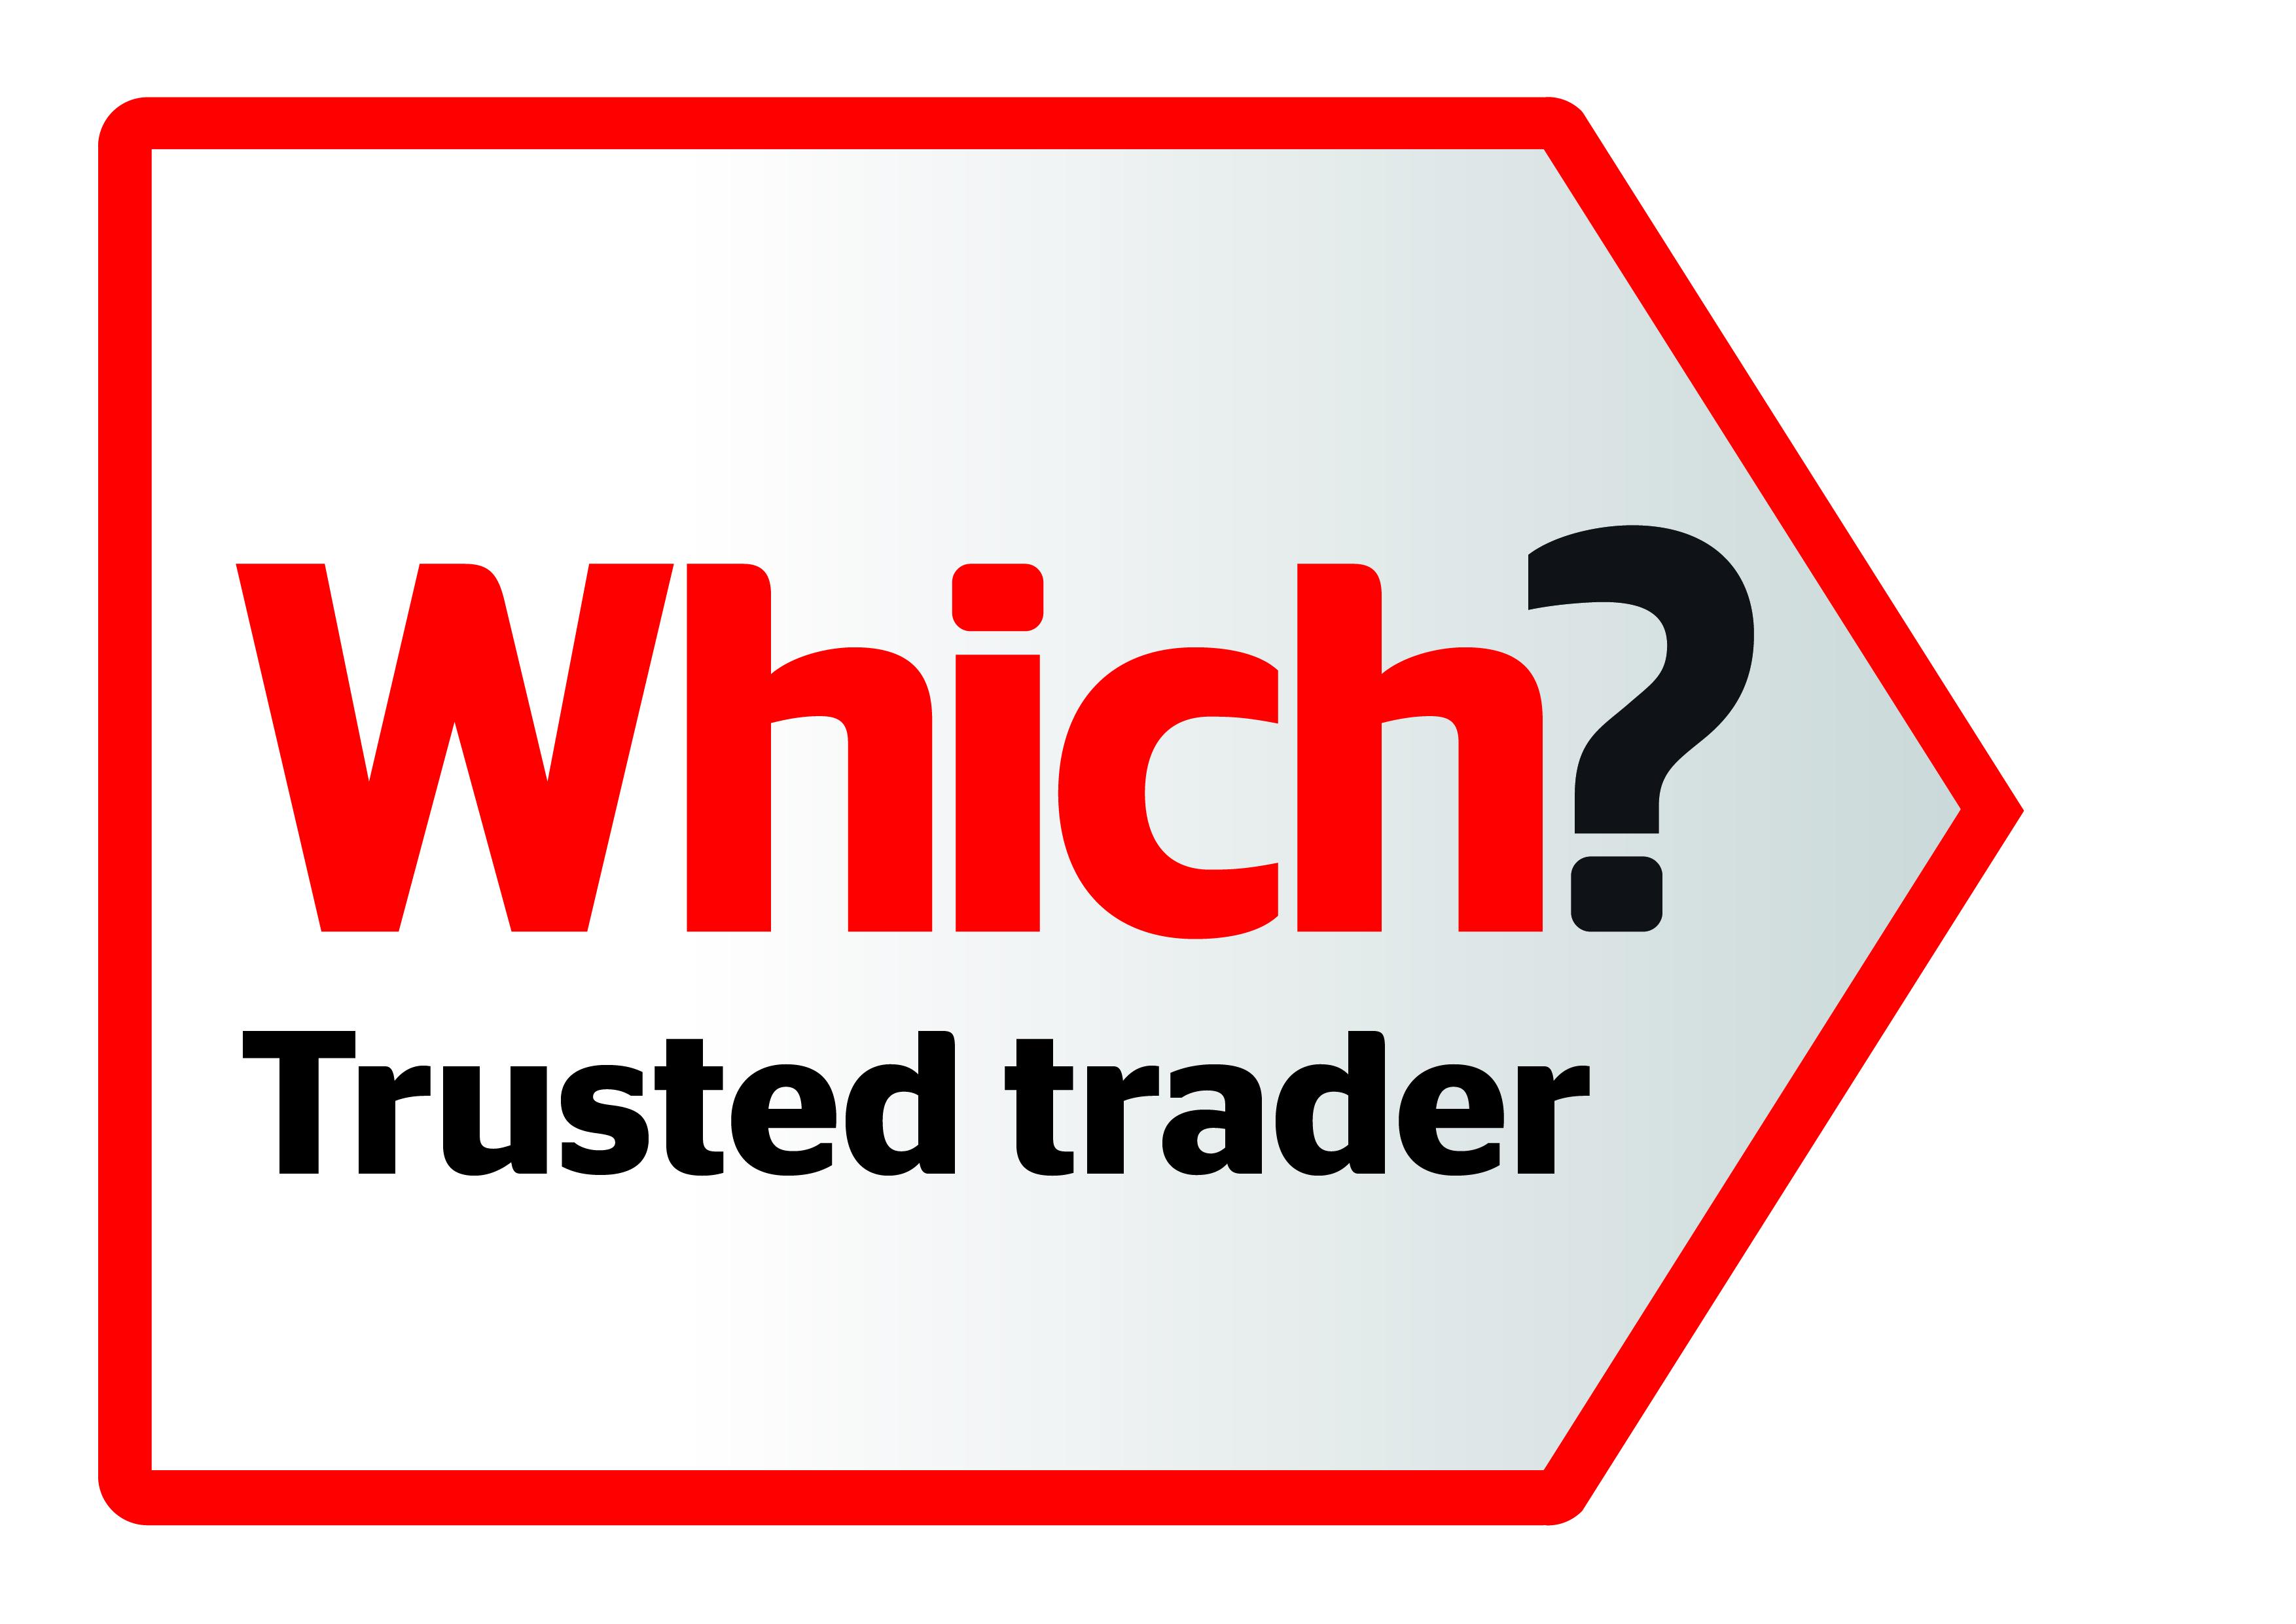 Avelex-Which-trusted-trader-logo.jpg